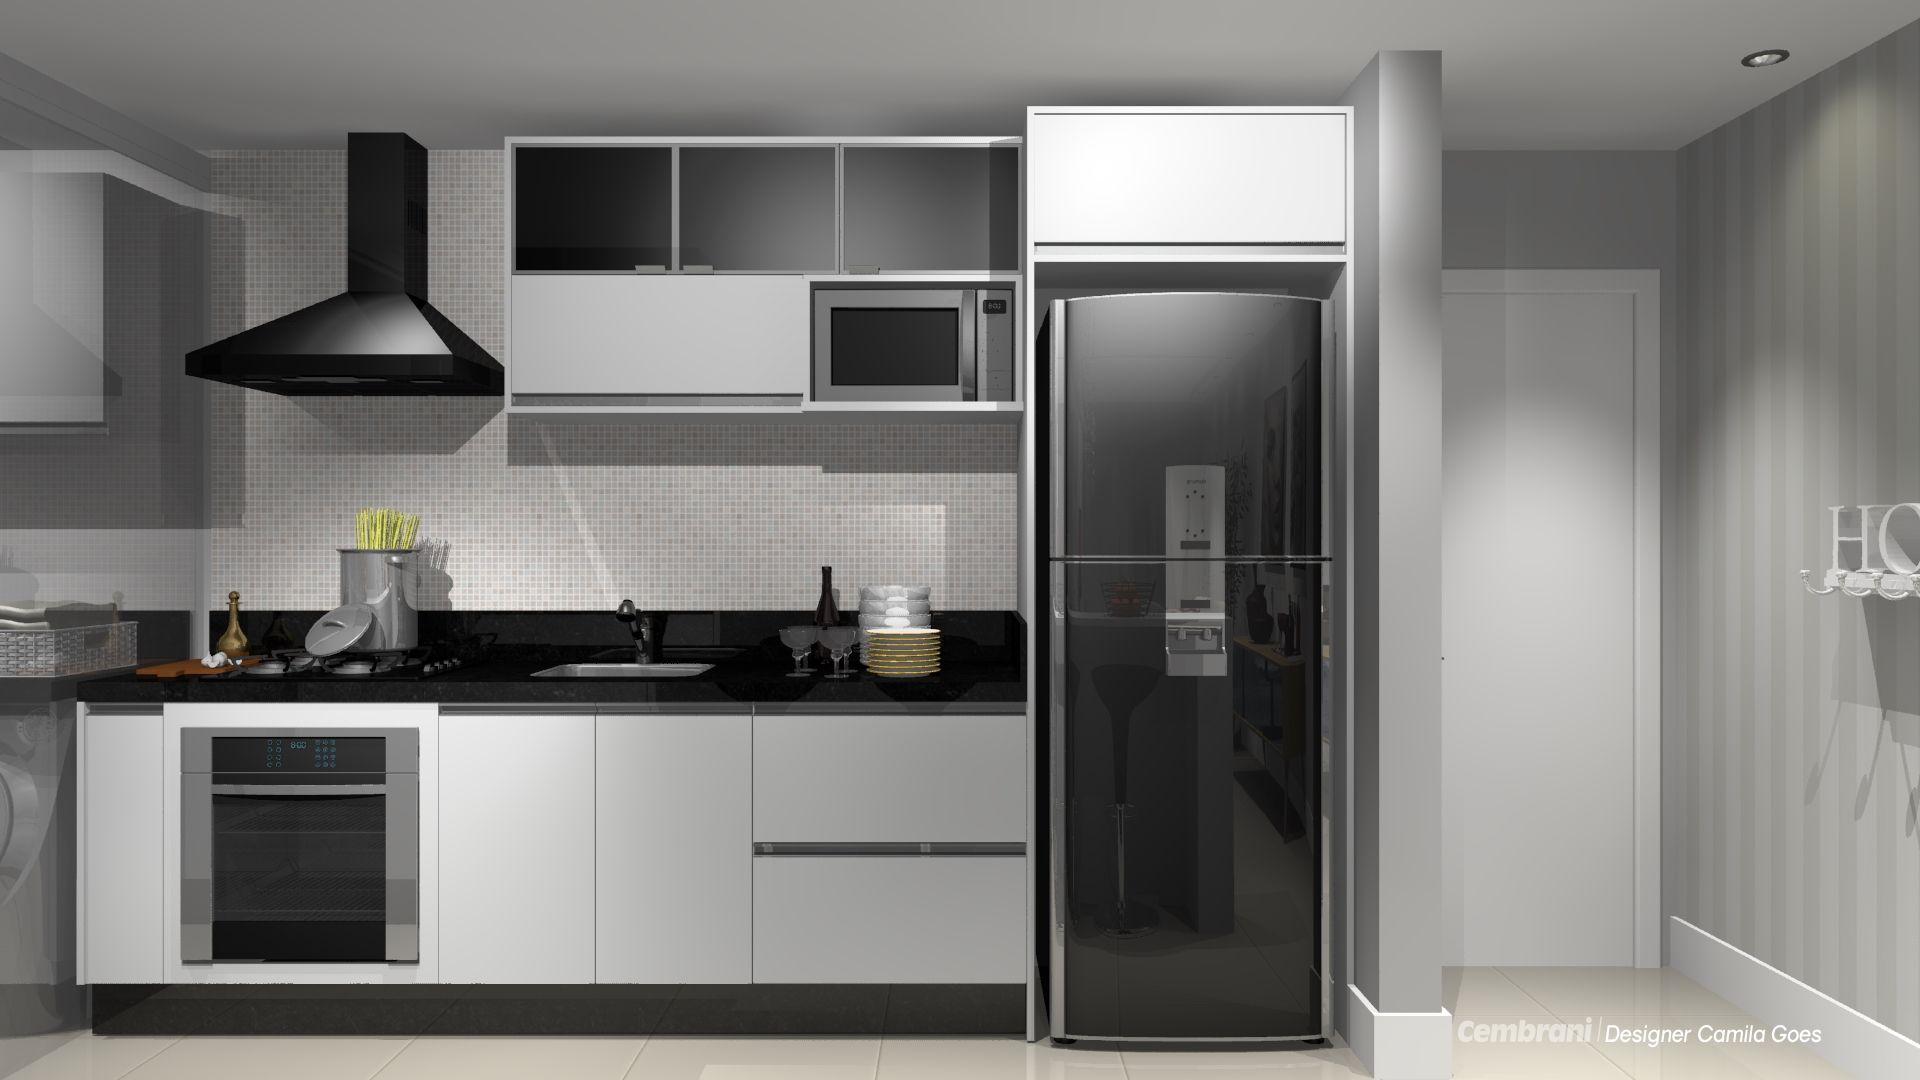 Decor Geladeira Preta Kitchens House Remodeling And House